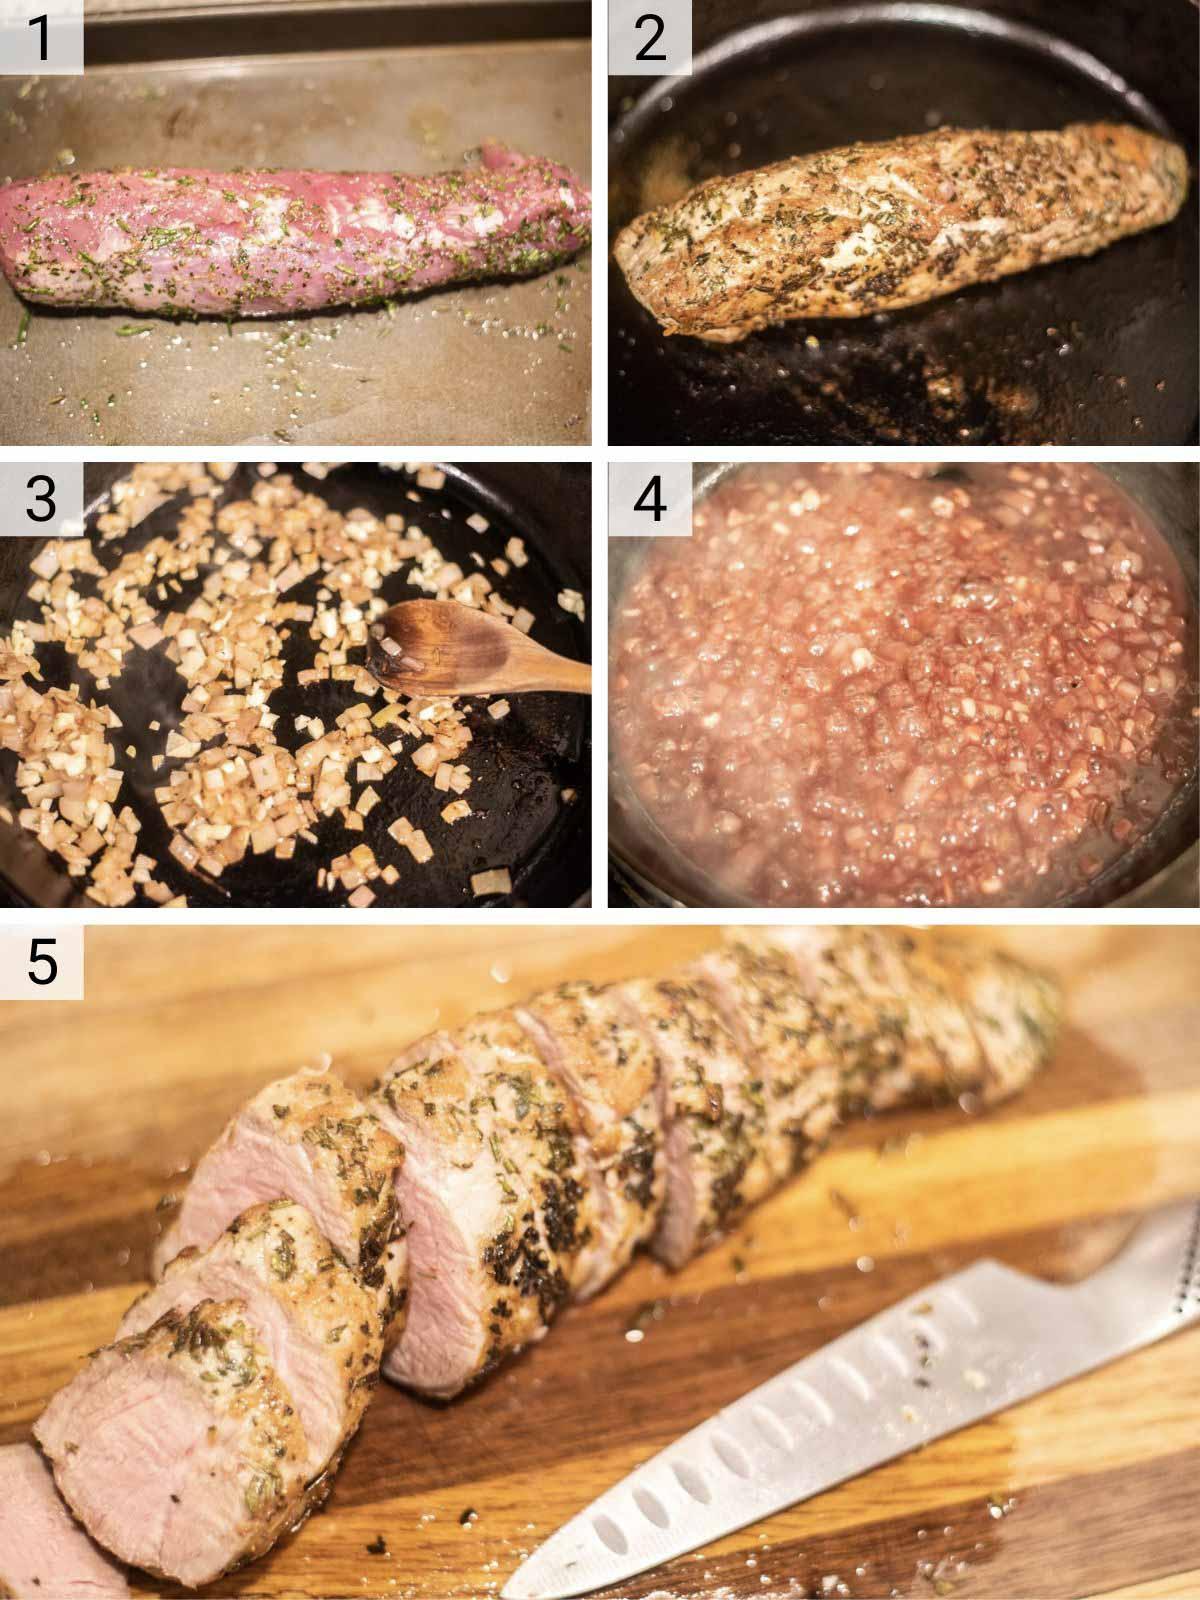 process shots of how to make rosemary pork tenderloin